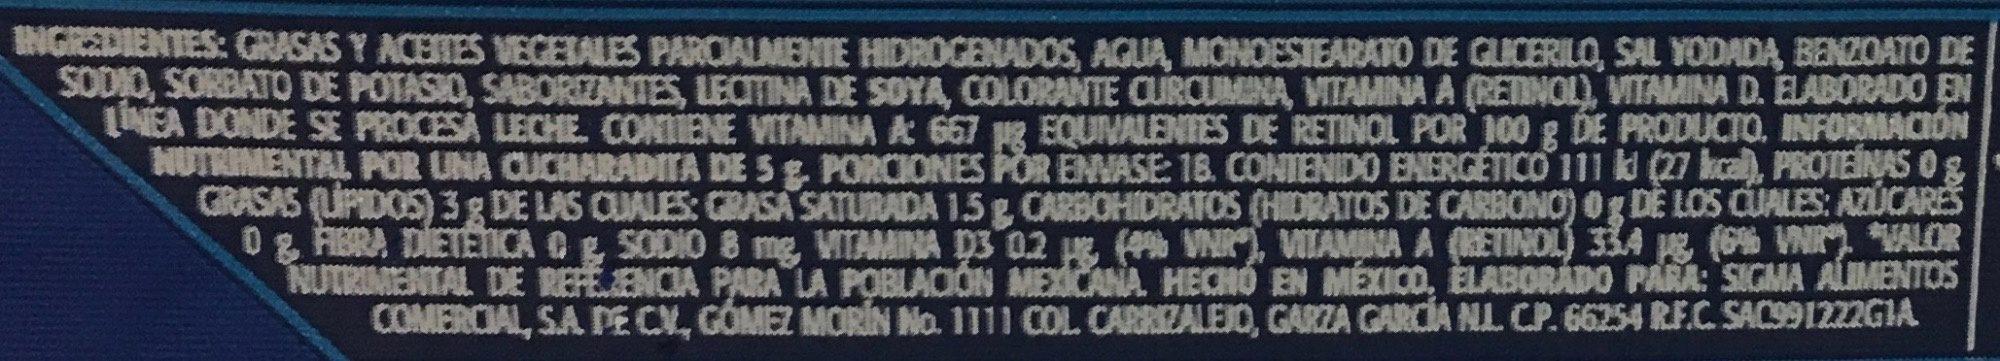 Margarina sin sal La villita - Voedingswaarden - es